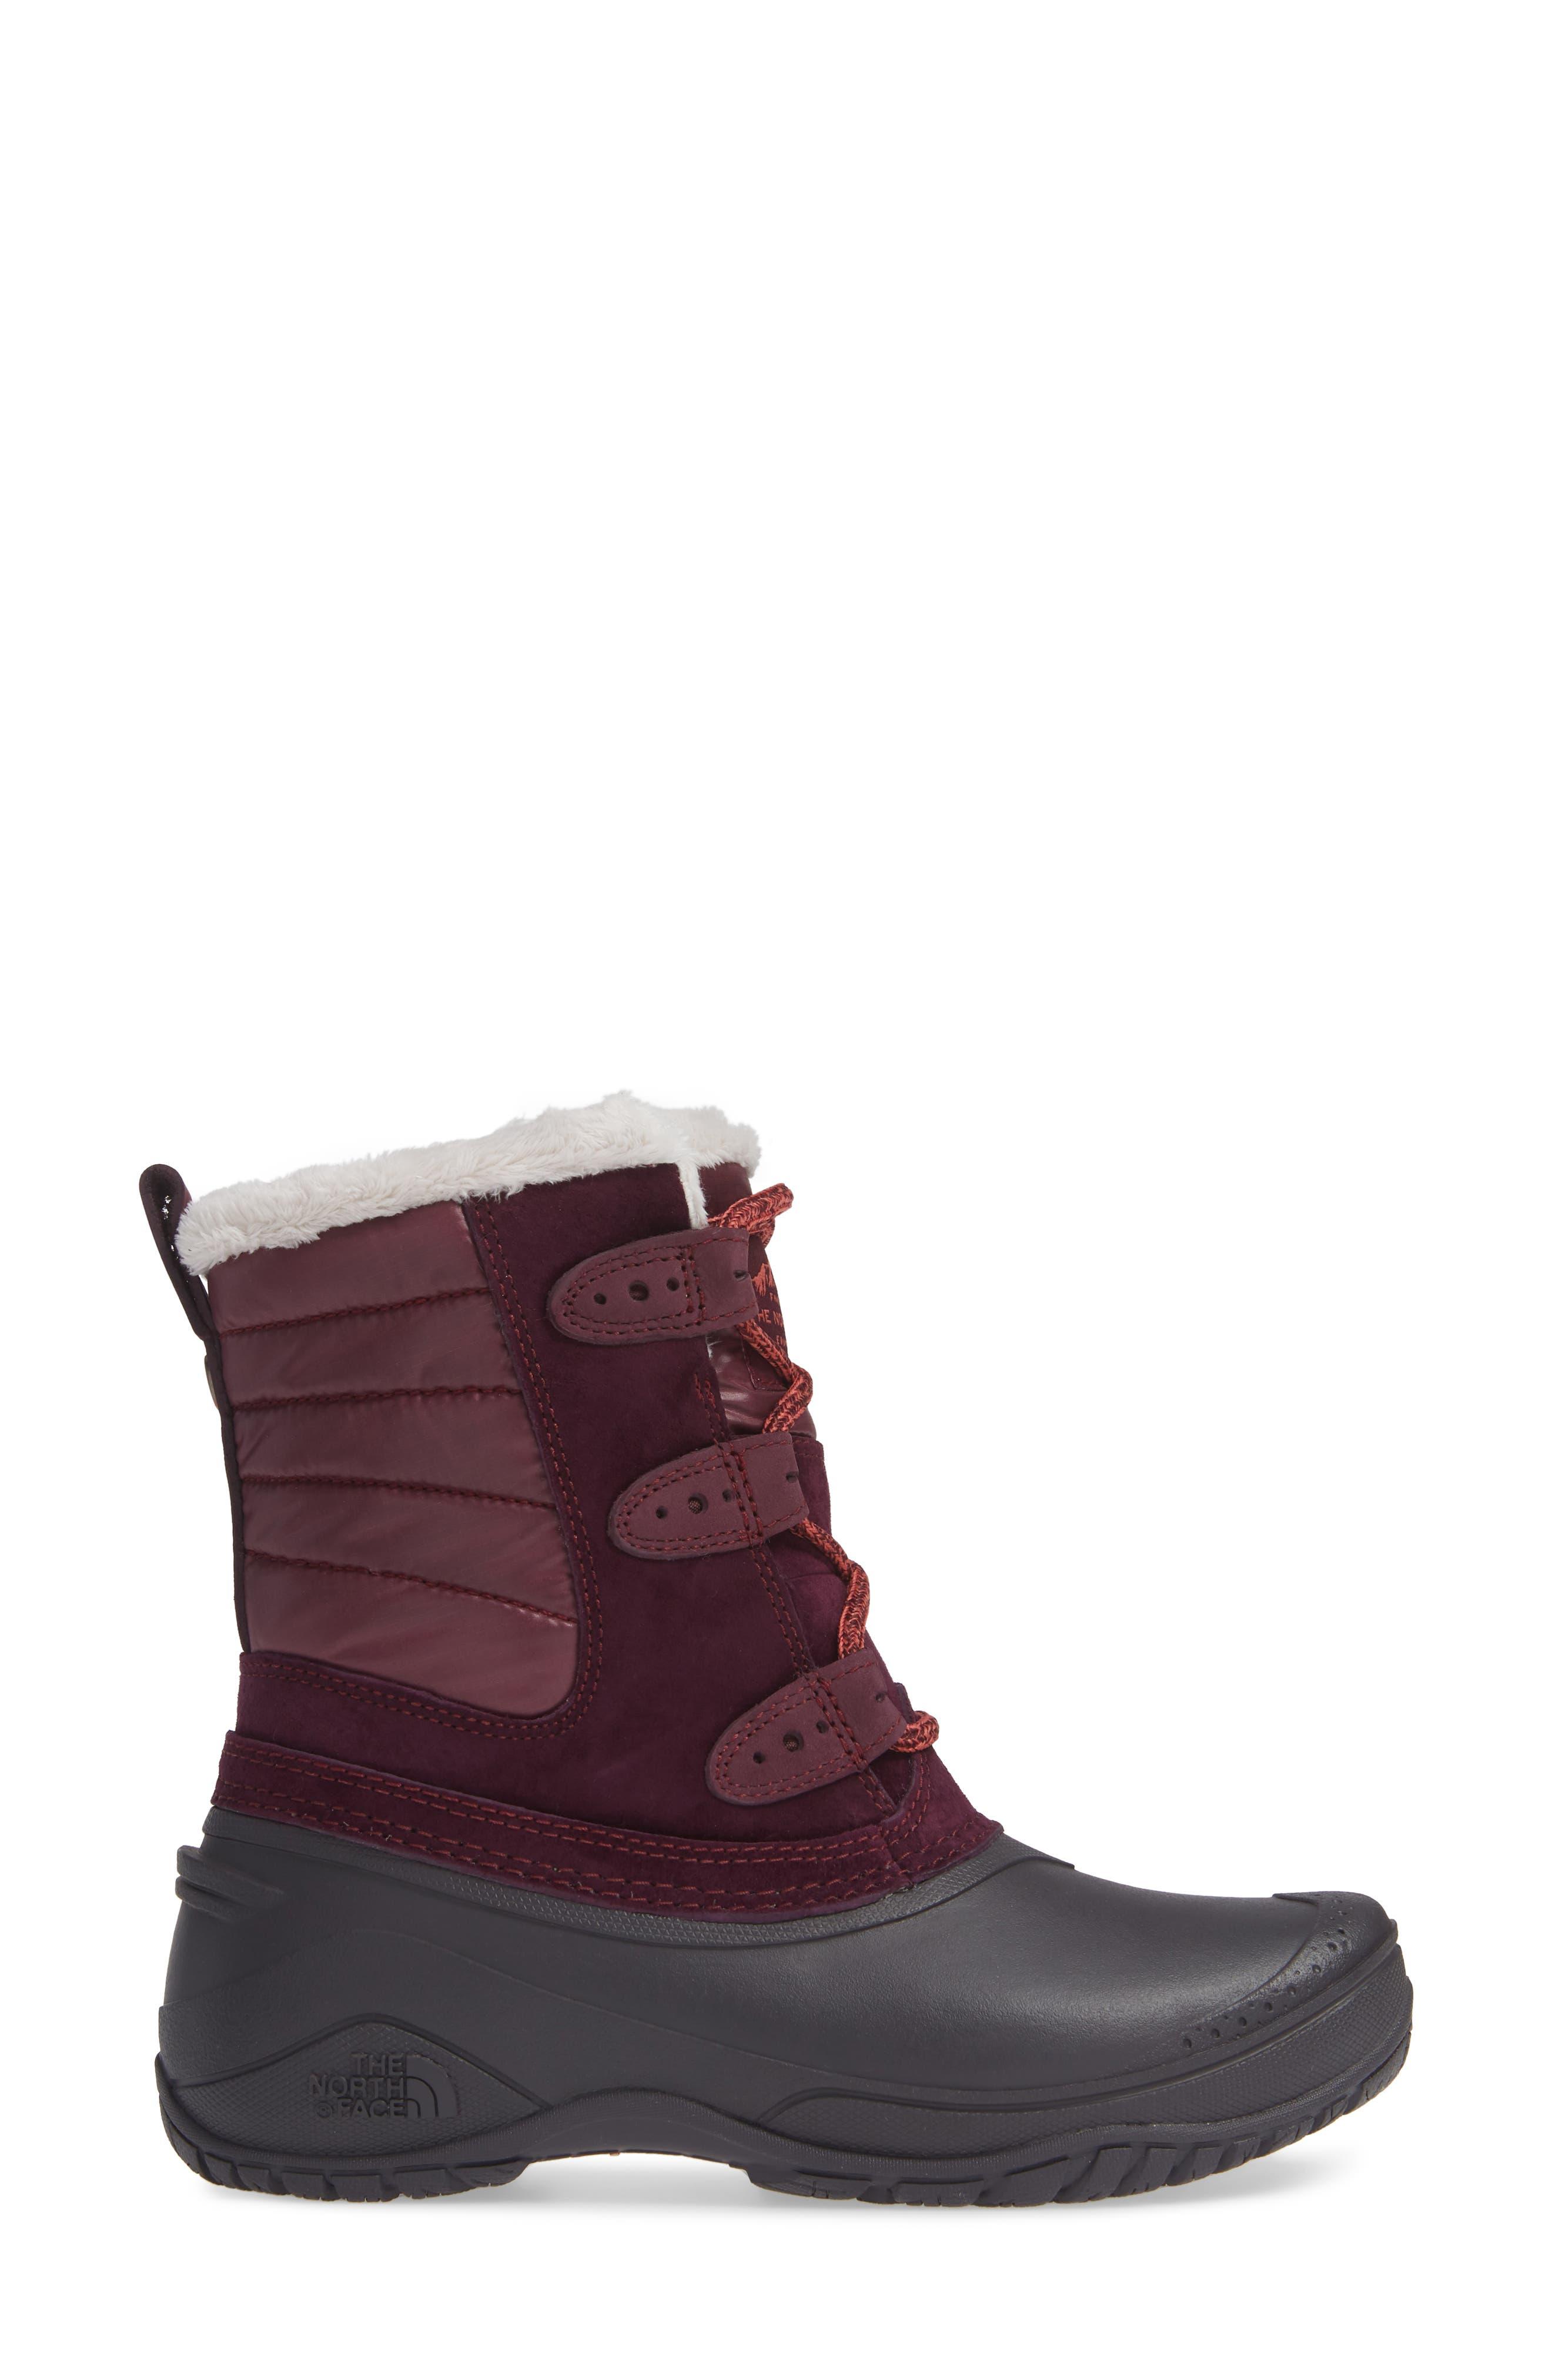 Shellista II Waterproof Boot,                             Alternate thumbnail 3, color,                             930